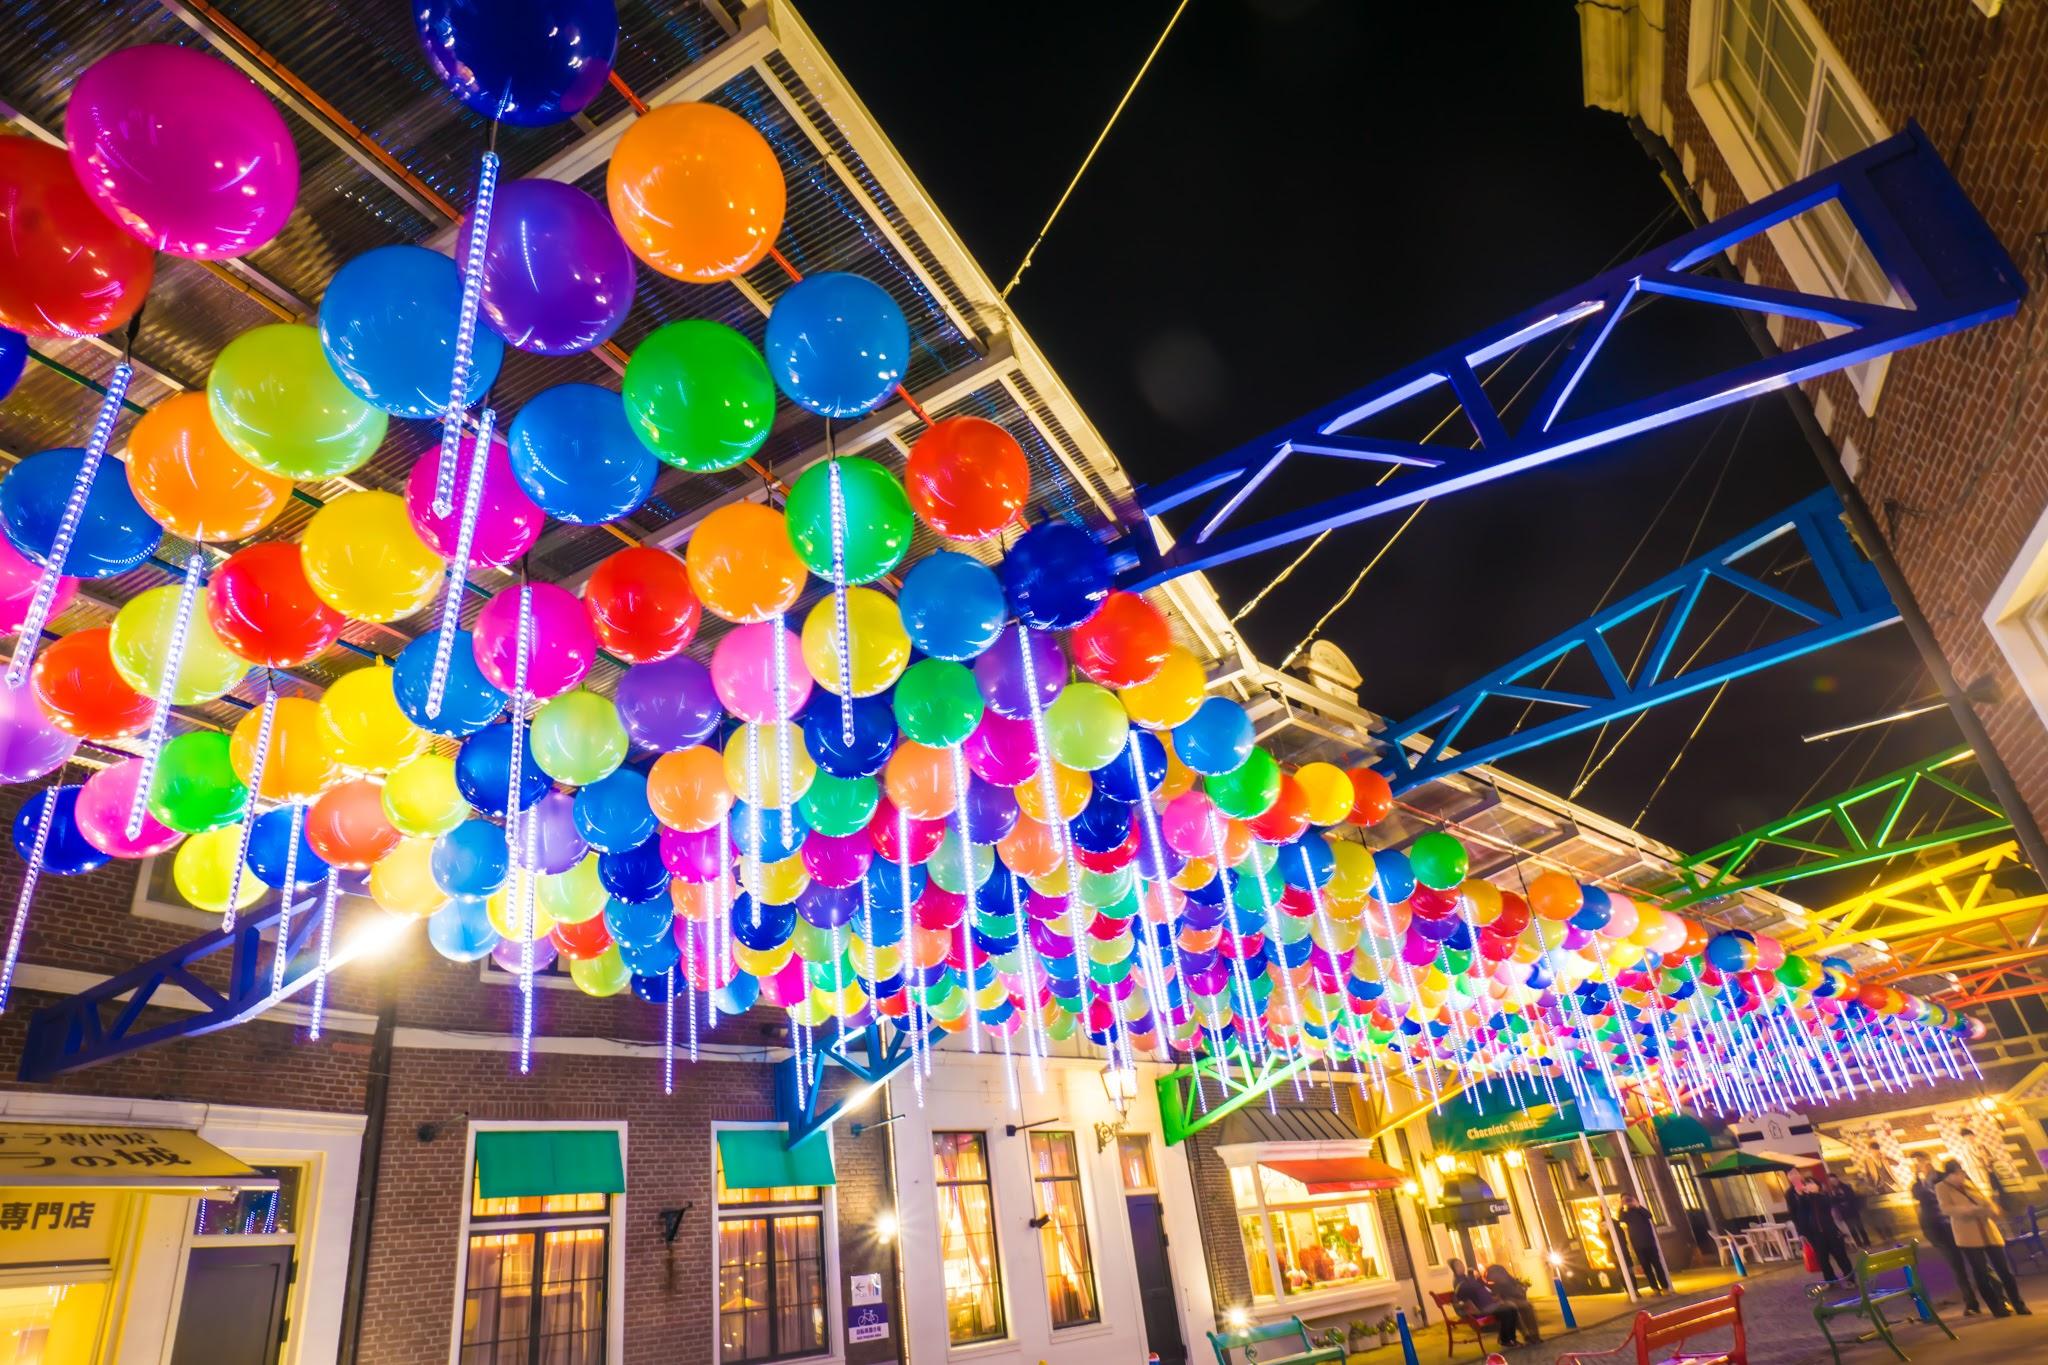 Huis Ten Bosch illumination Kingdom of light Happy balloon street2